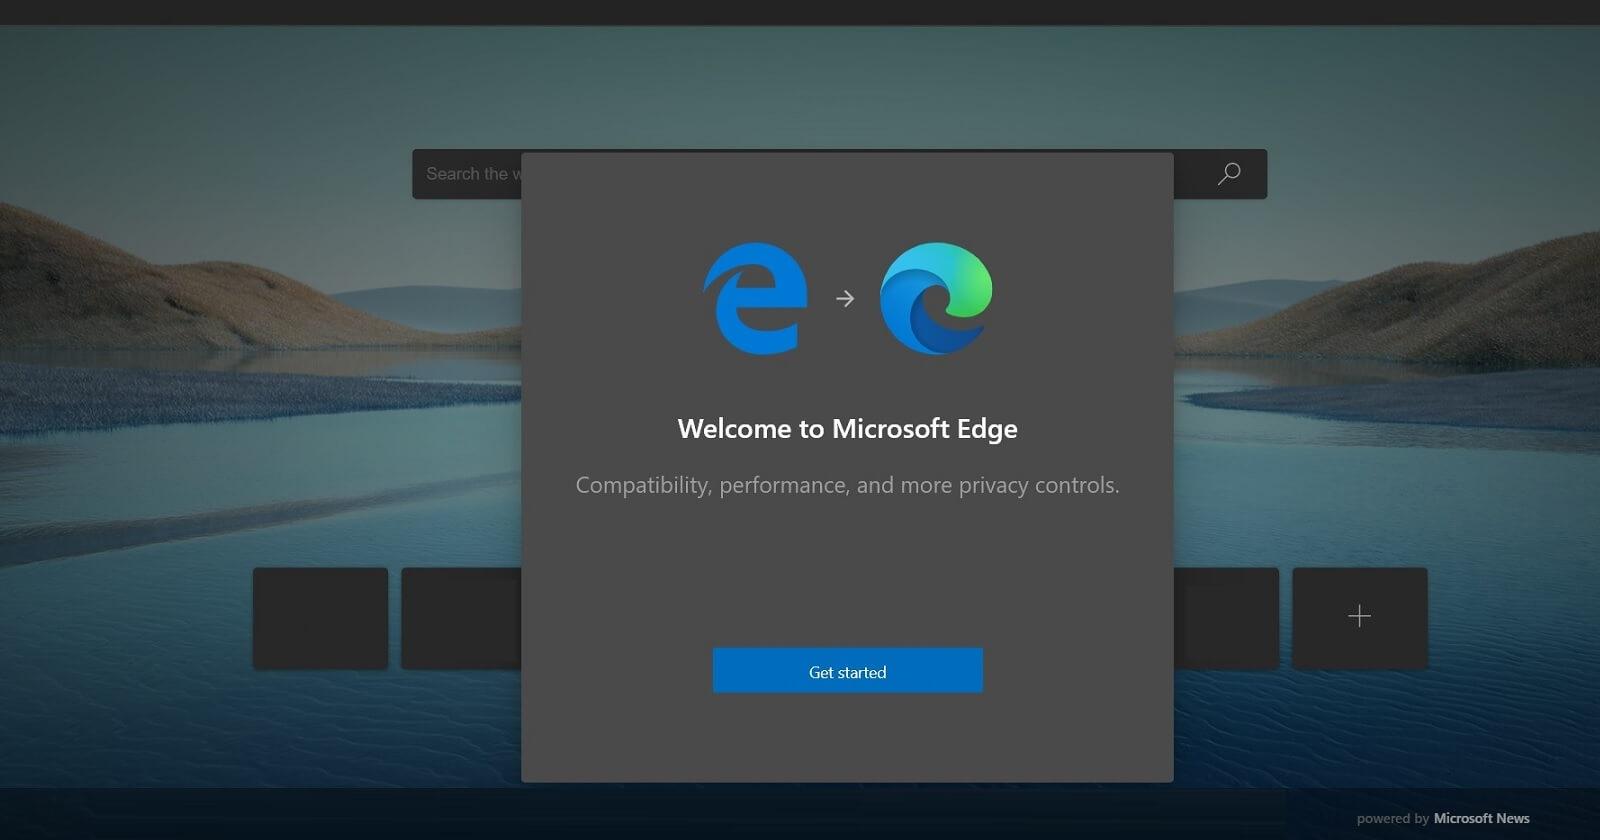 Microsoft Edge migration